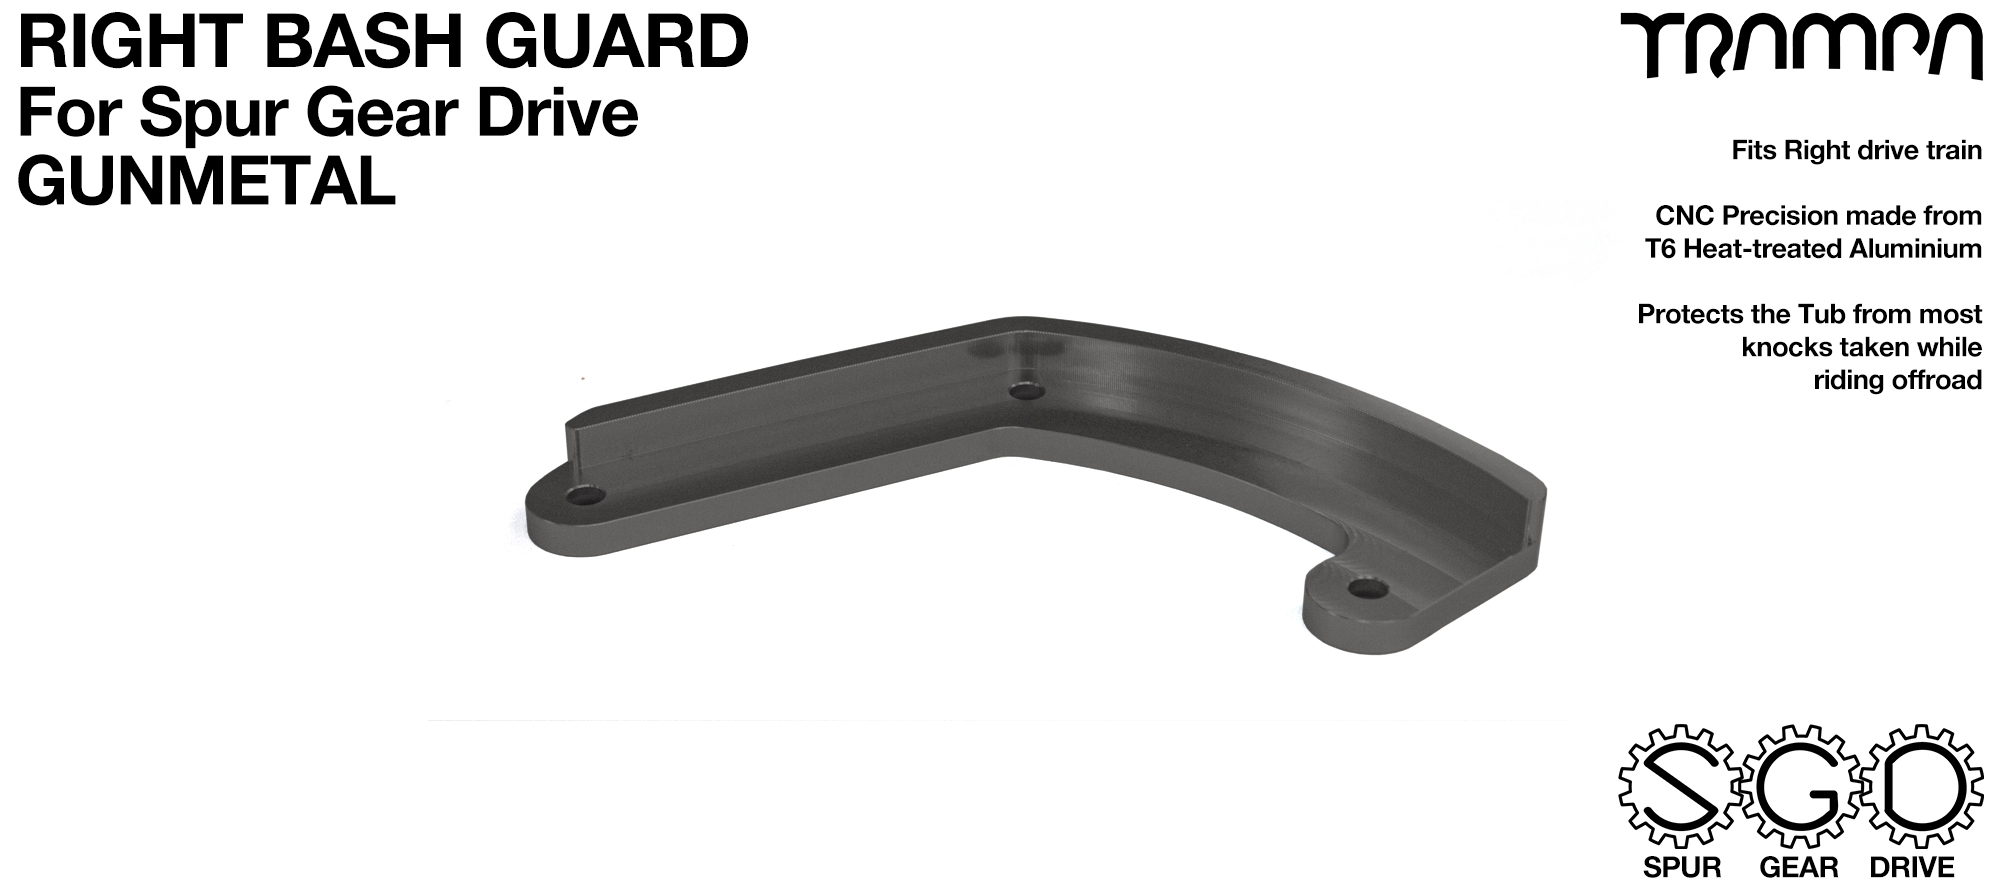 MkII Spur Gear Drive Bash Guard - RIGHT Side - GUNMETAL